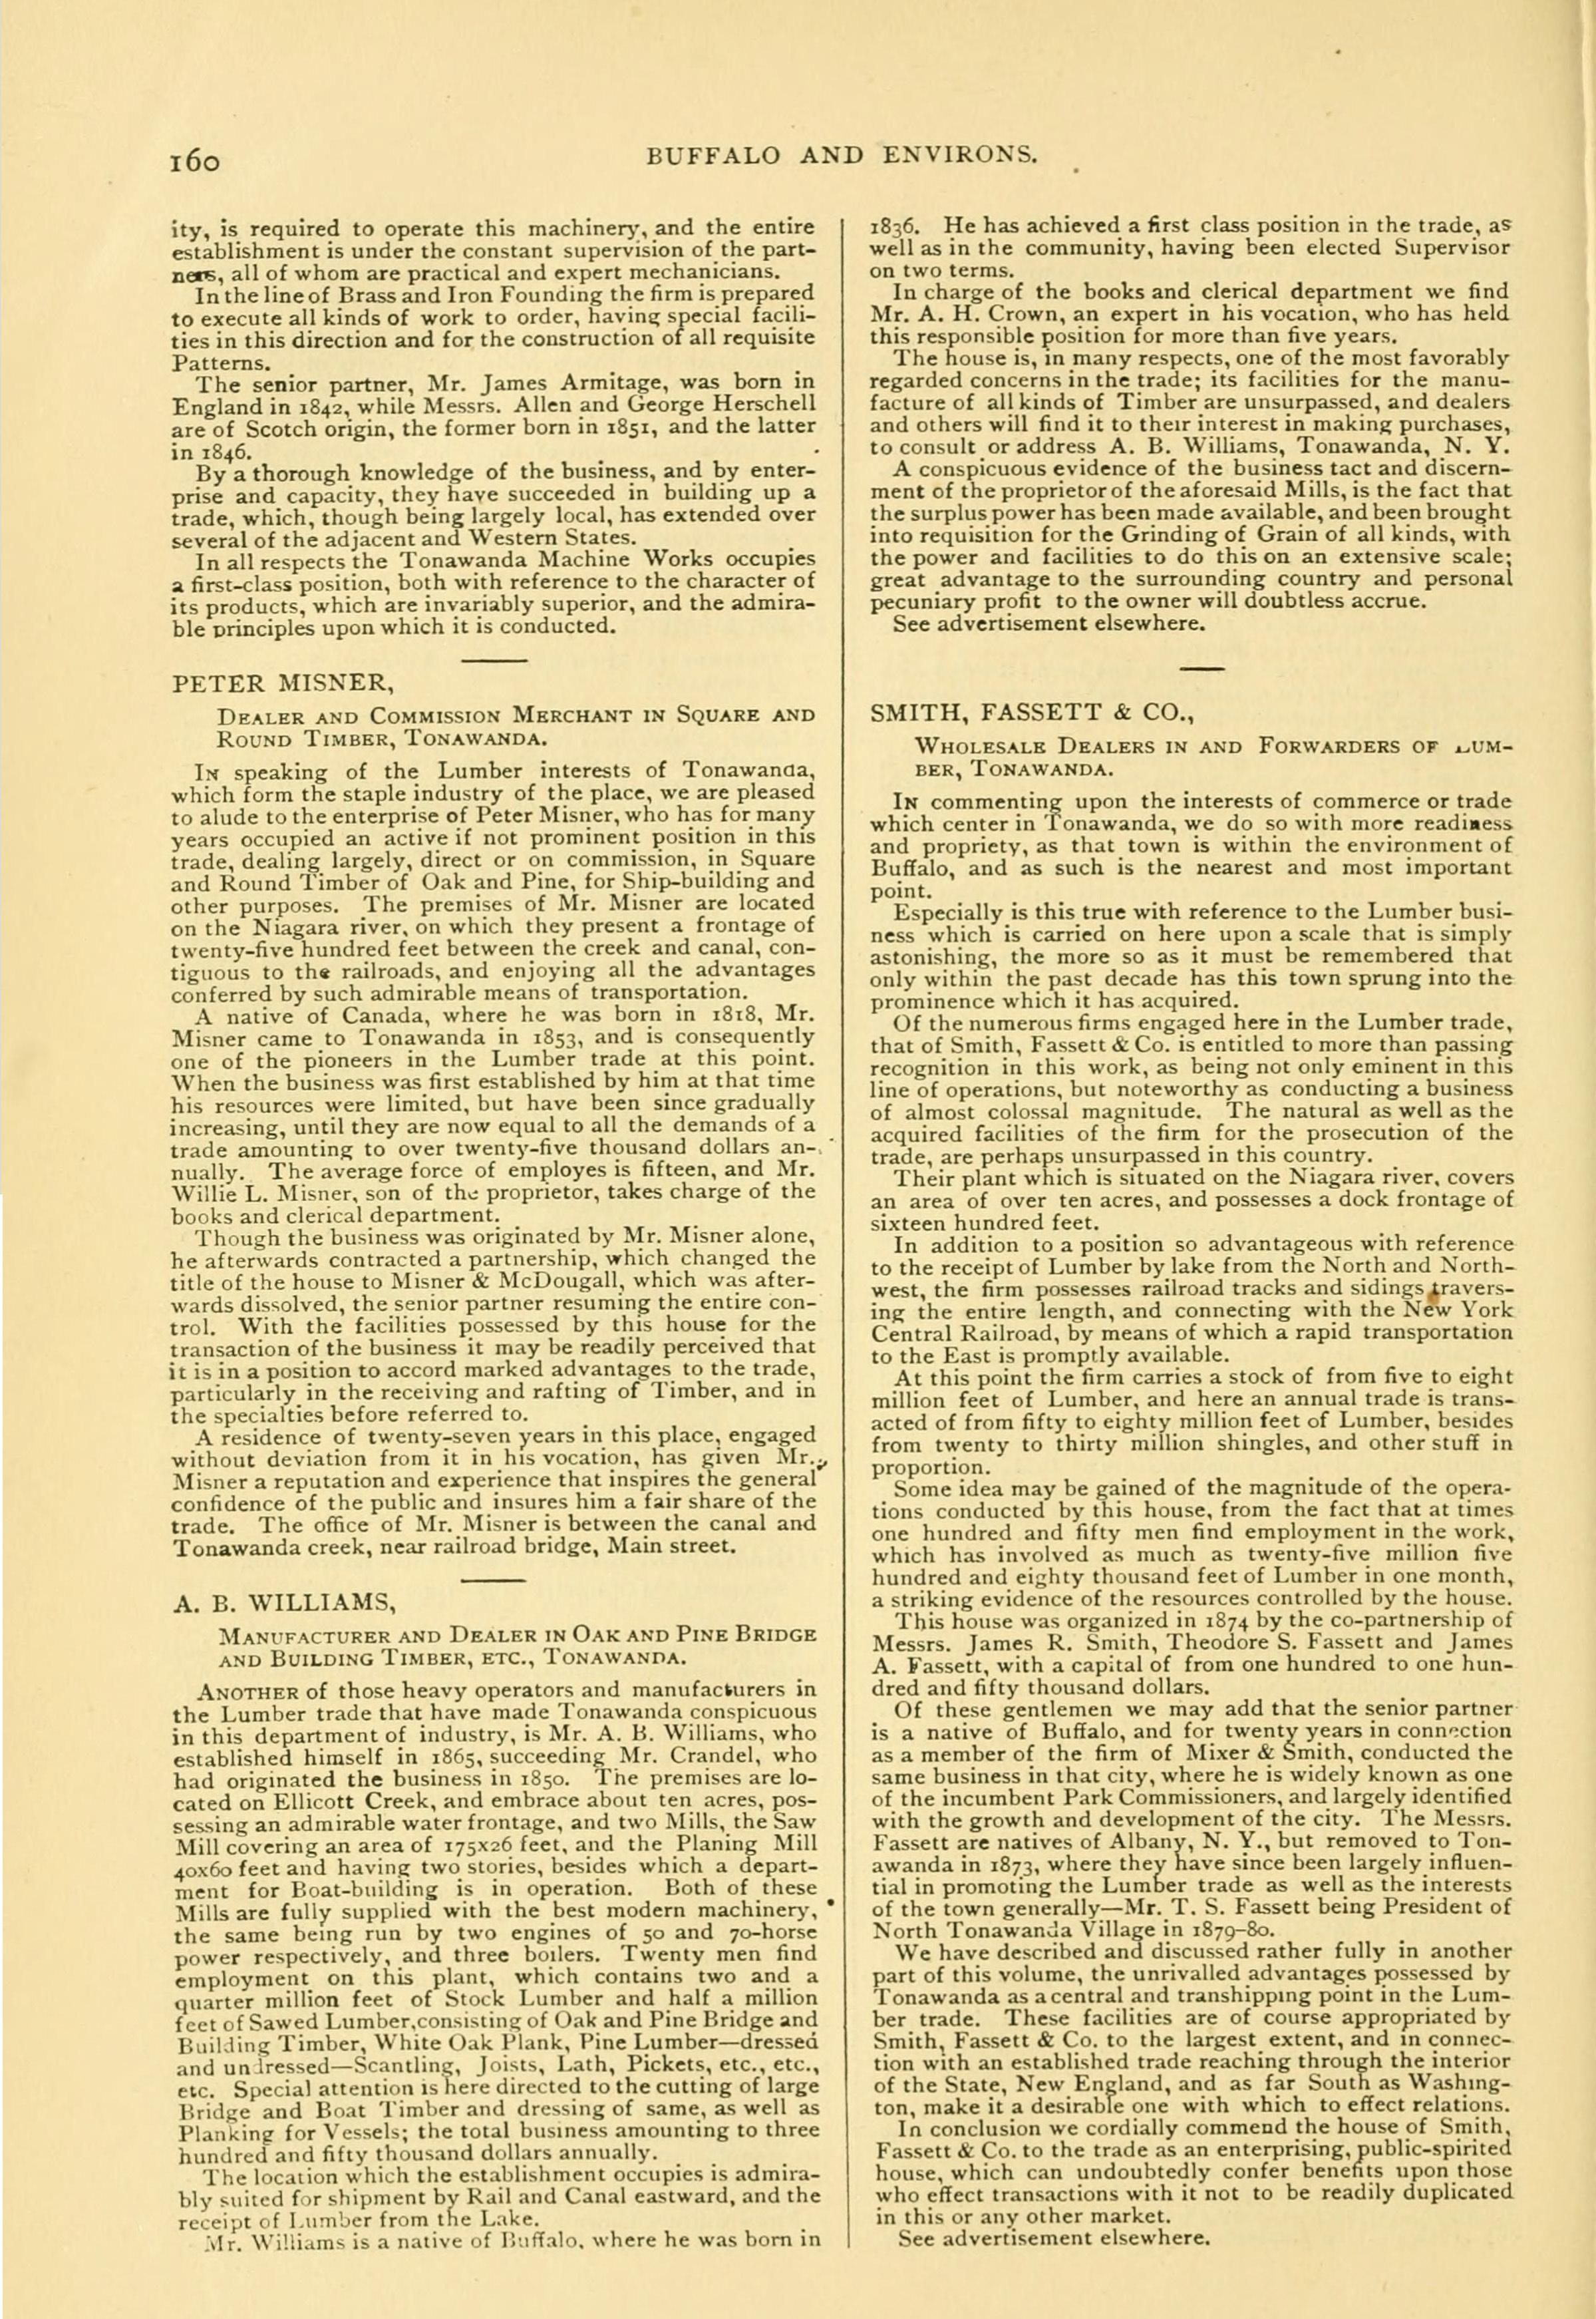 Tonawanda, book excerpt (Commerce, 1880) p160.jpg